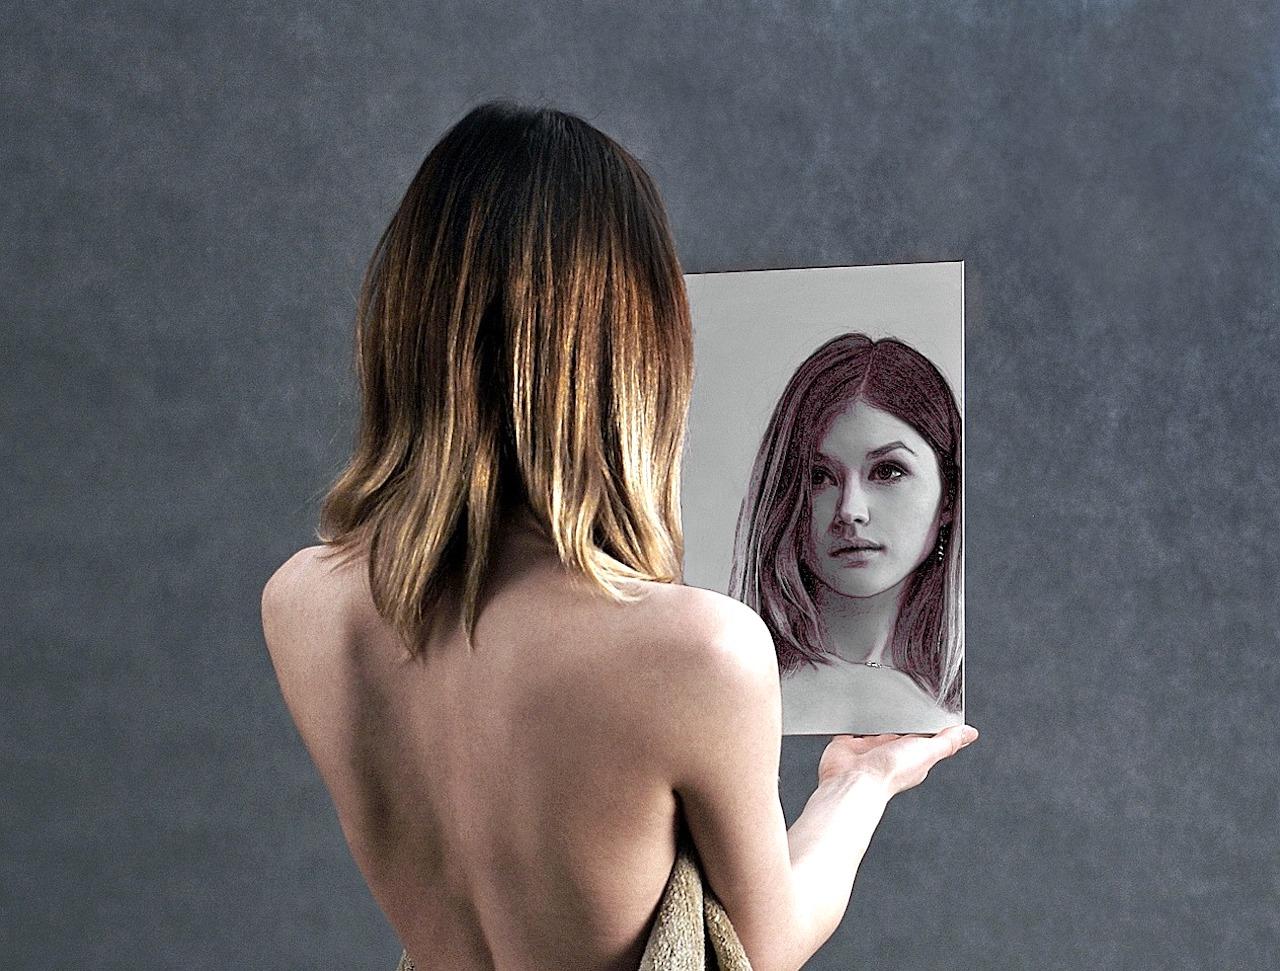 Portraitfotografie Ideen Spiegelbild